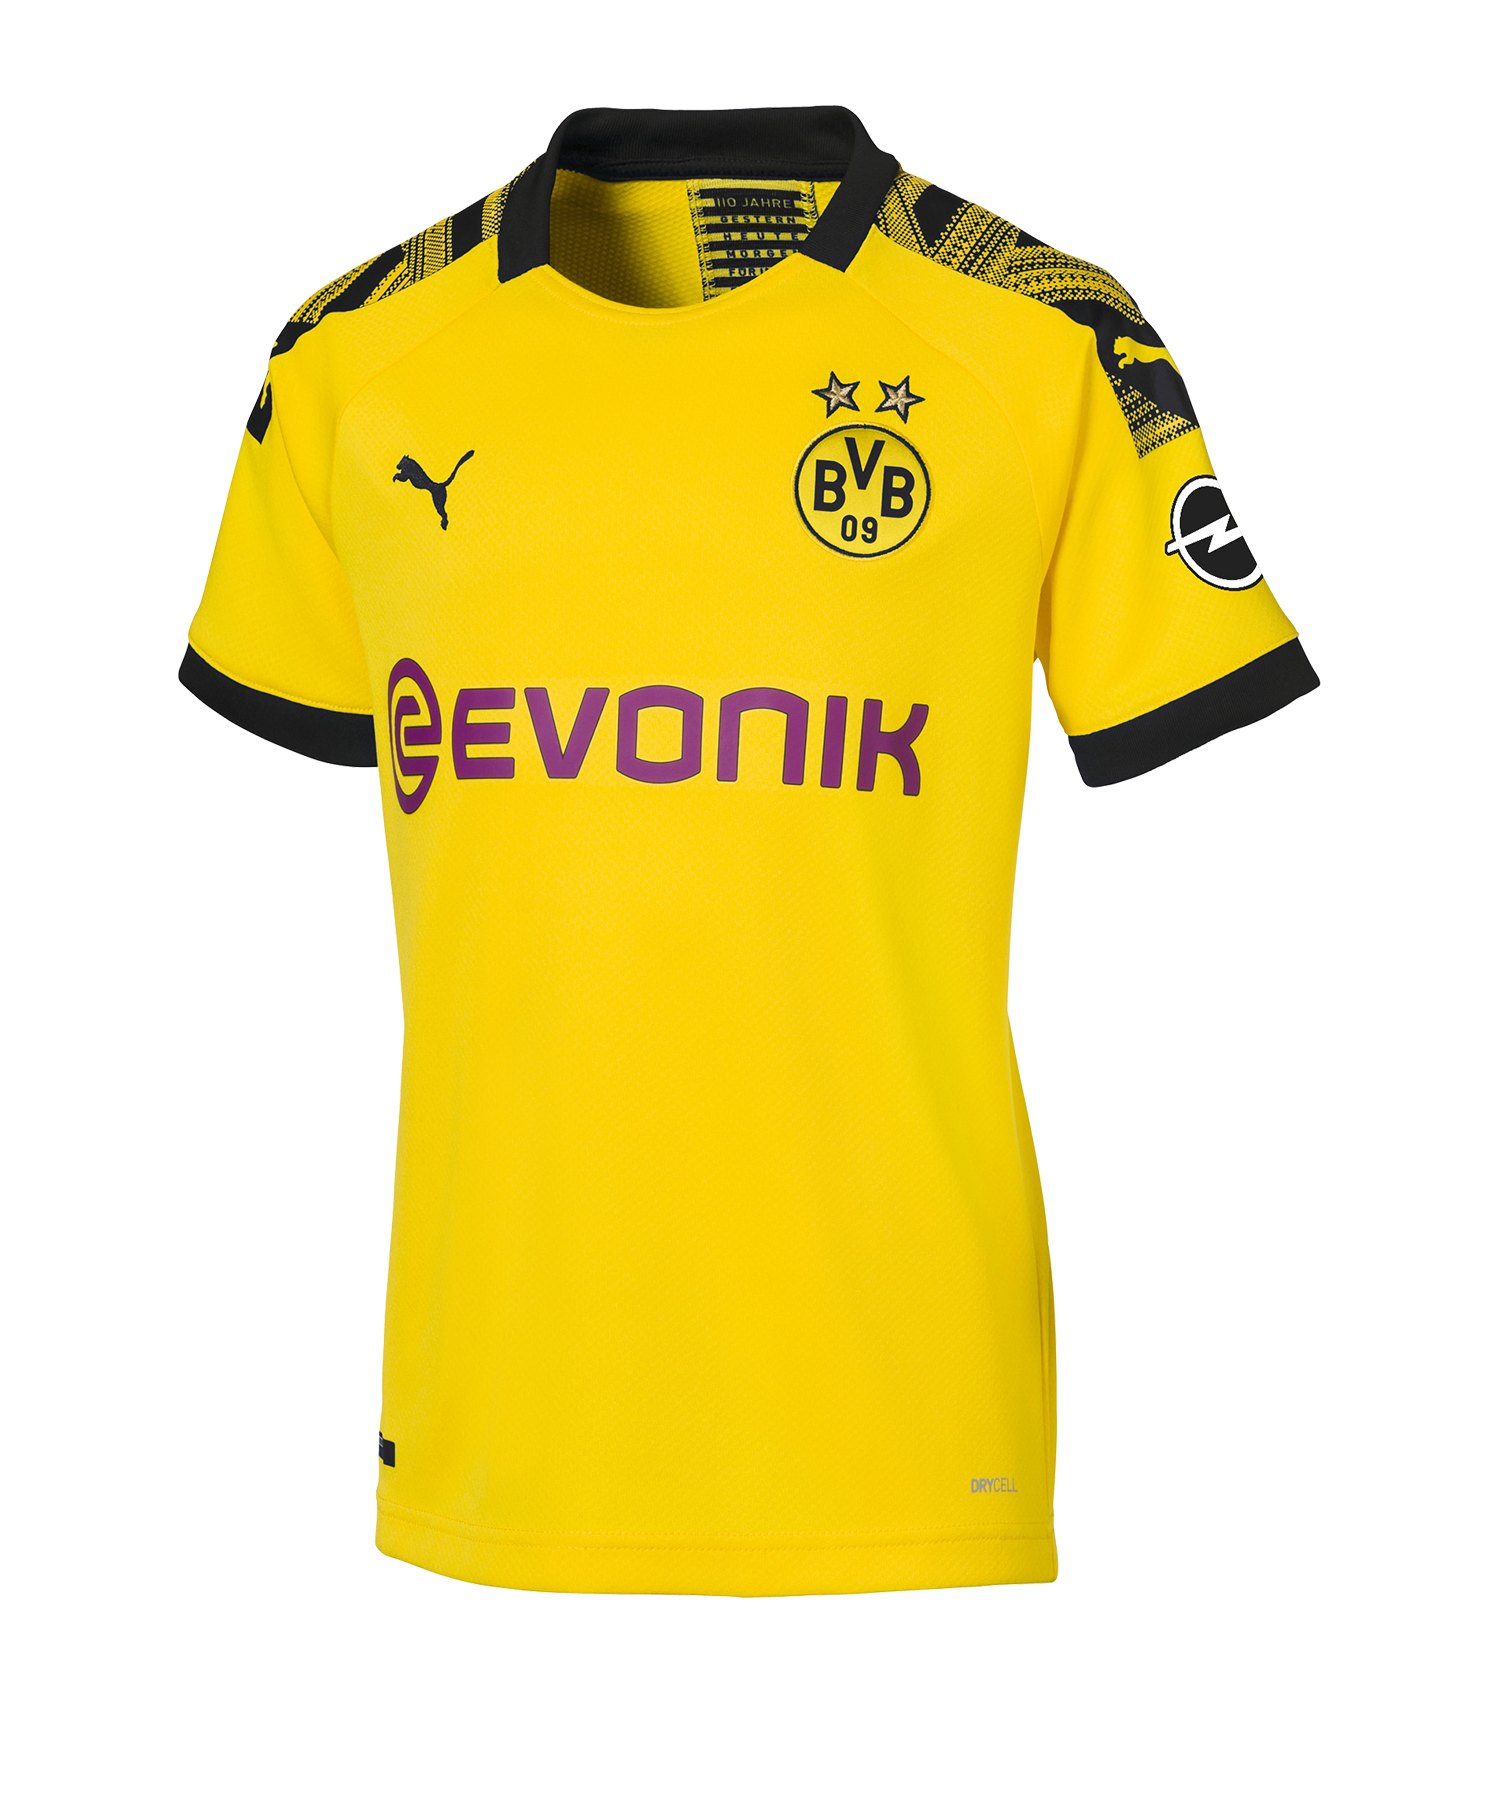 PUMA BVB Dortmund Trikot Home 2019/2020 Damen F01 - Gelb